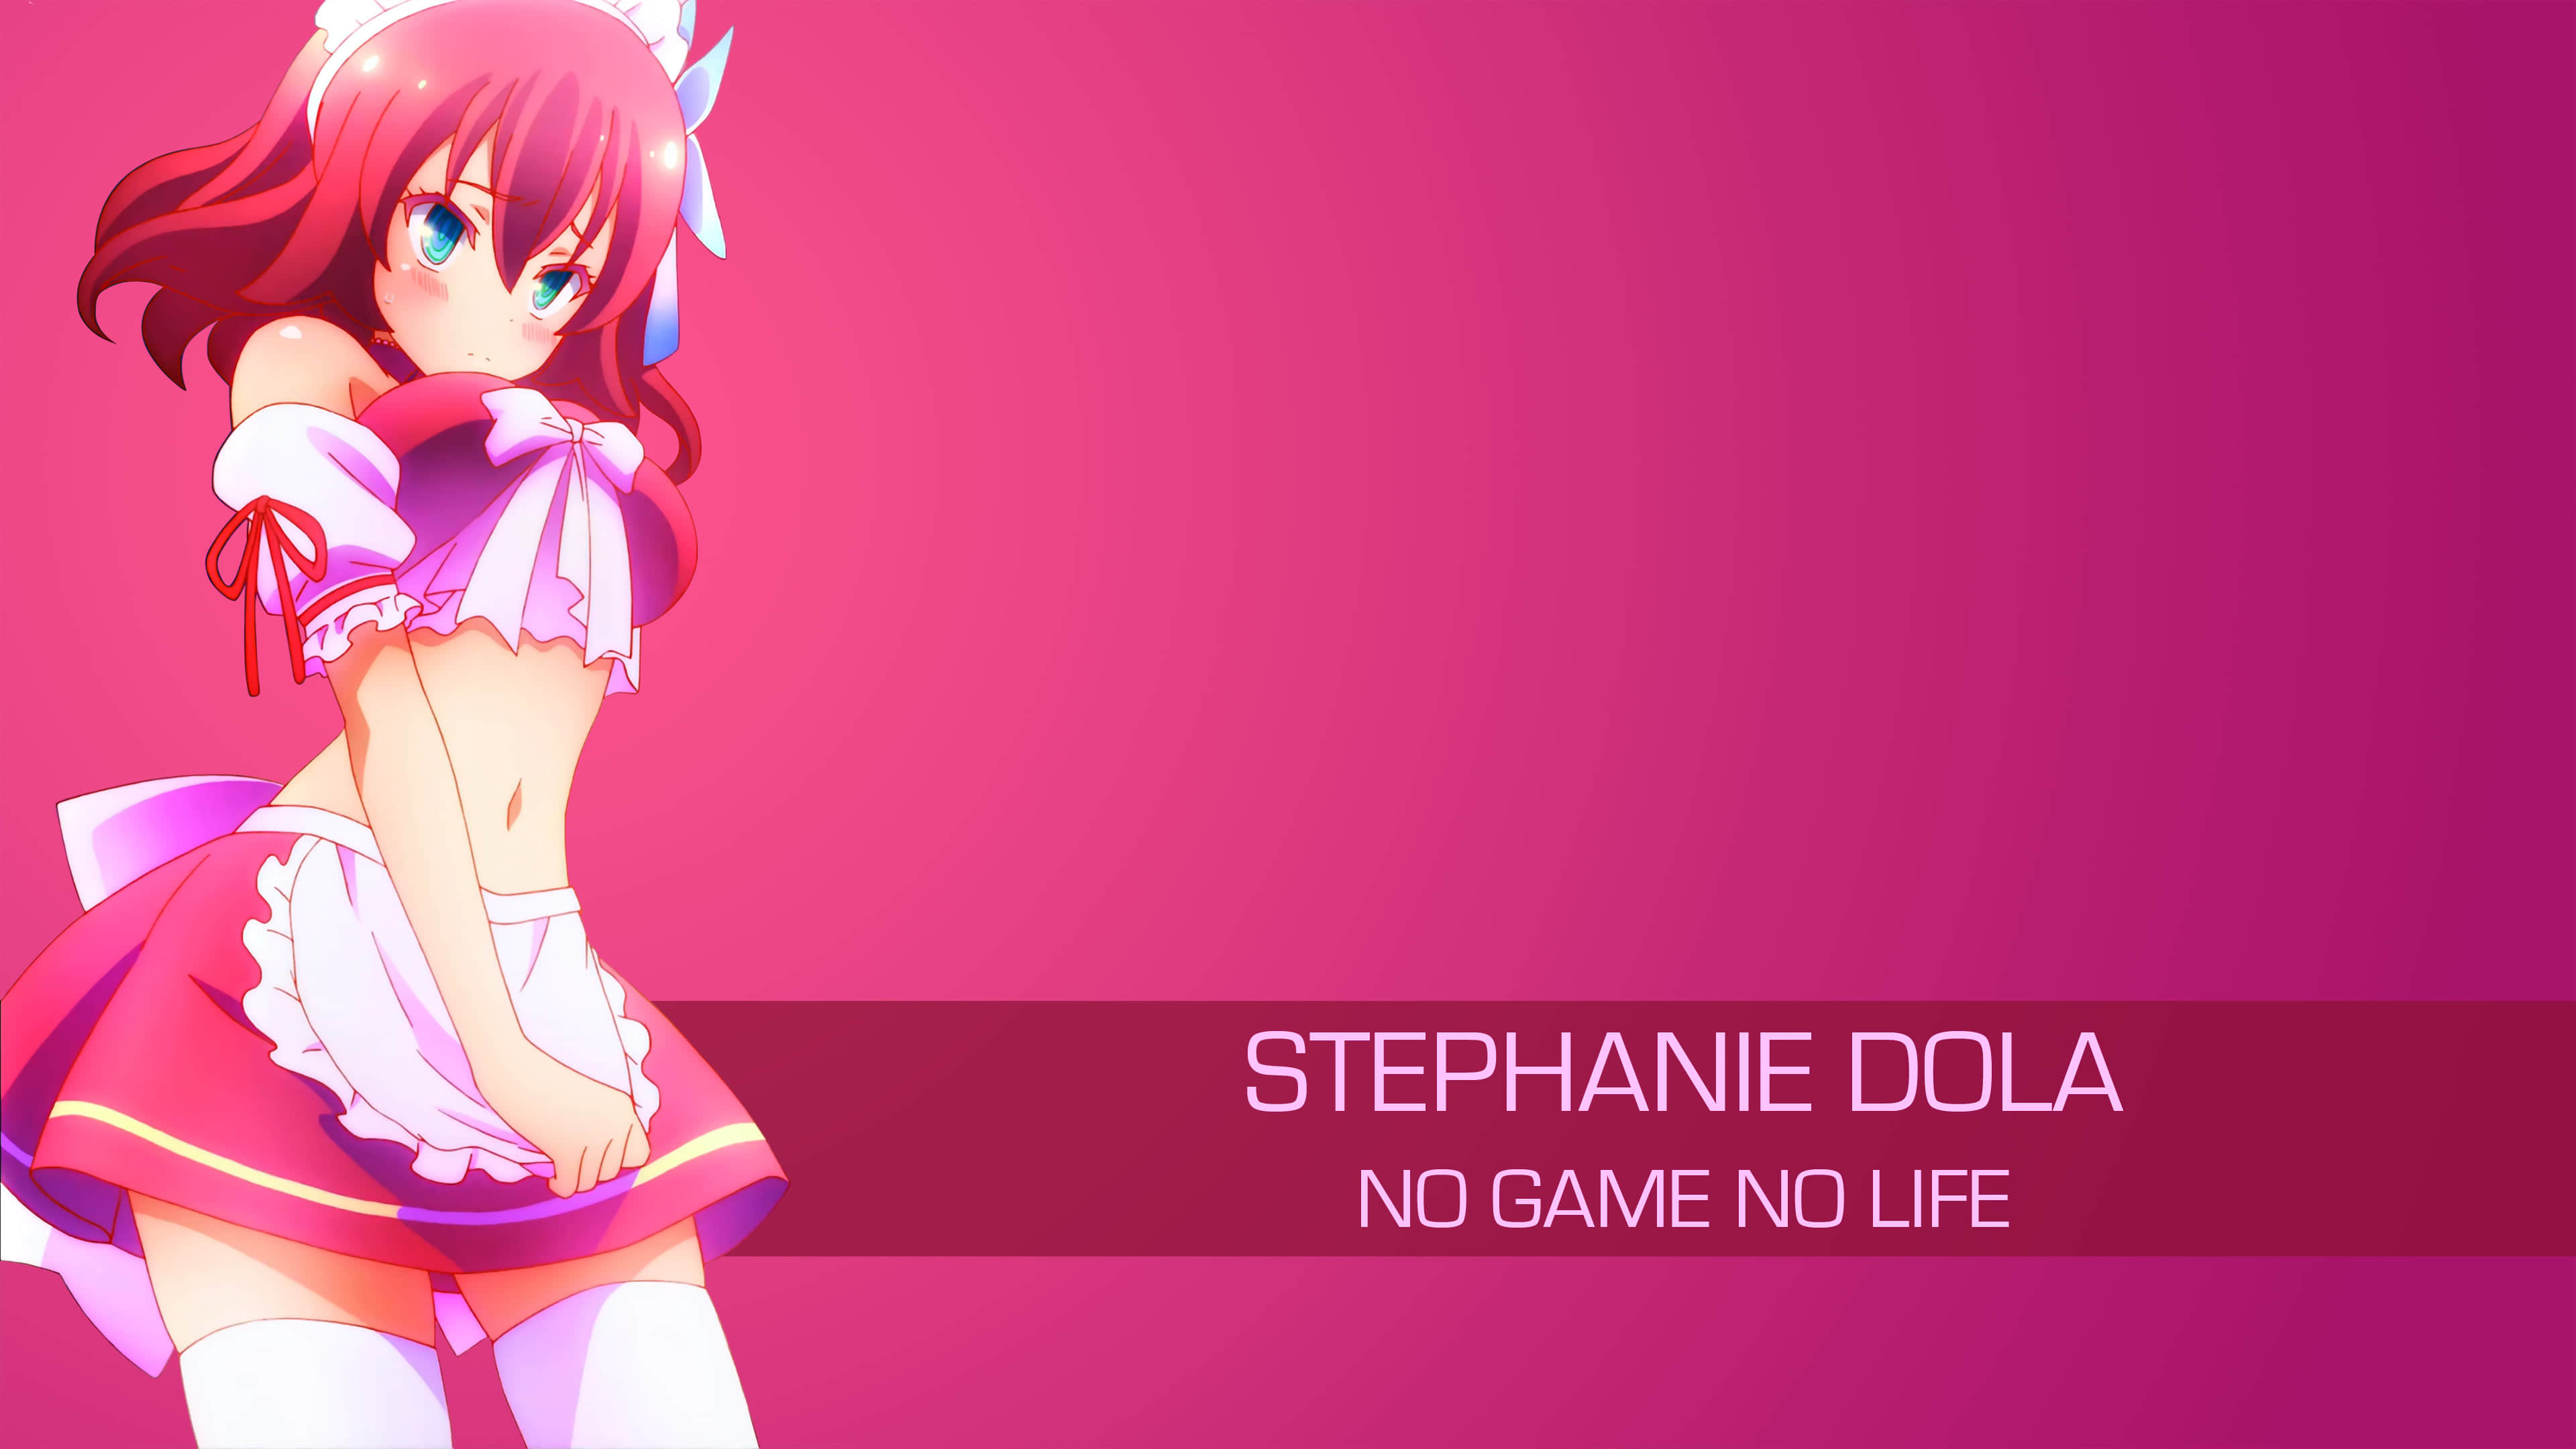 Stephanie Dola No Game No Life Uhd 4k Wallpaper Pixelz